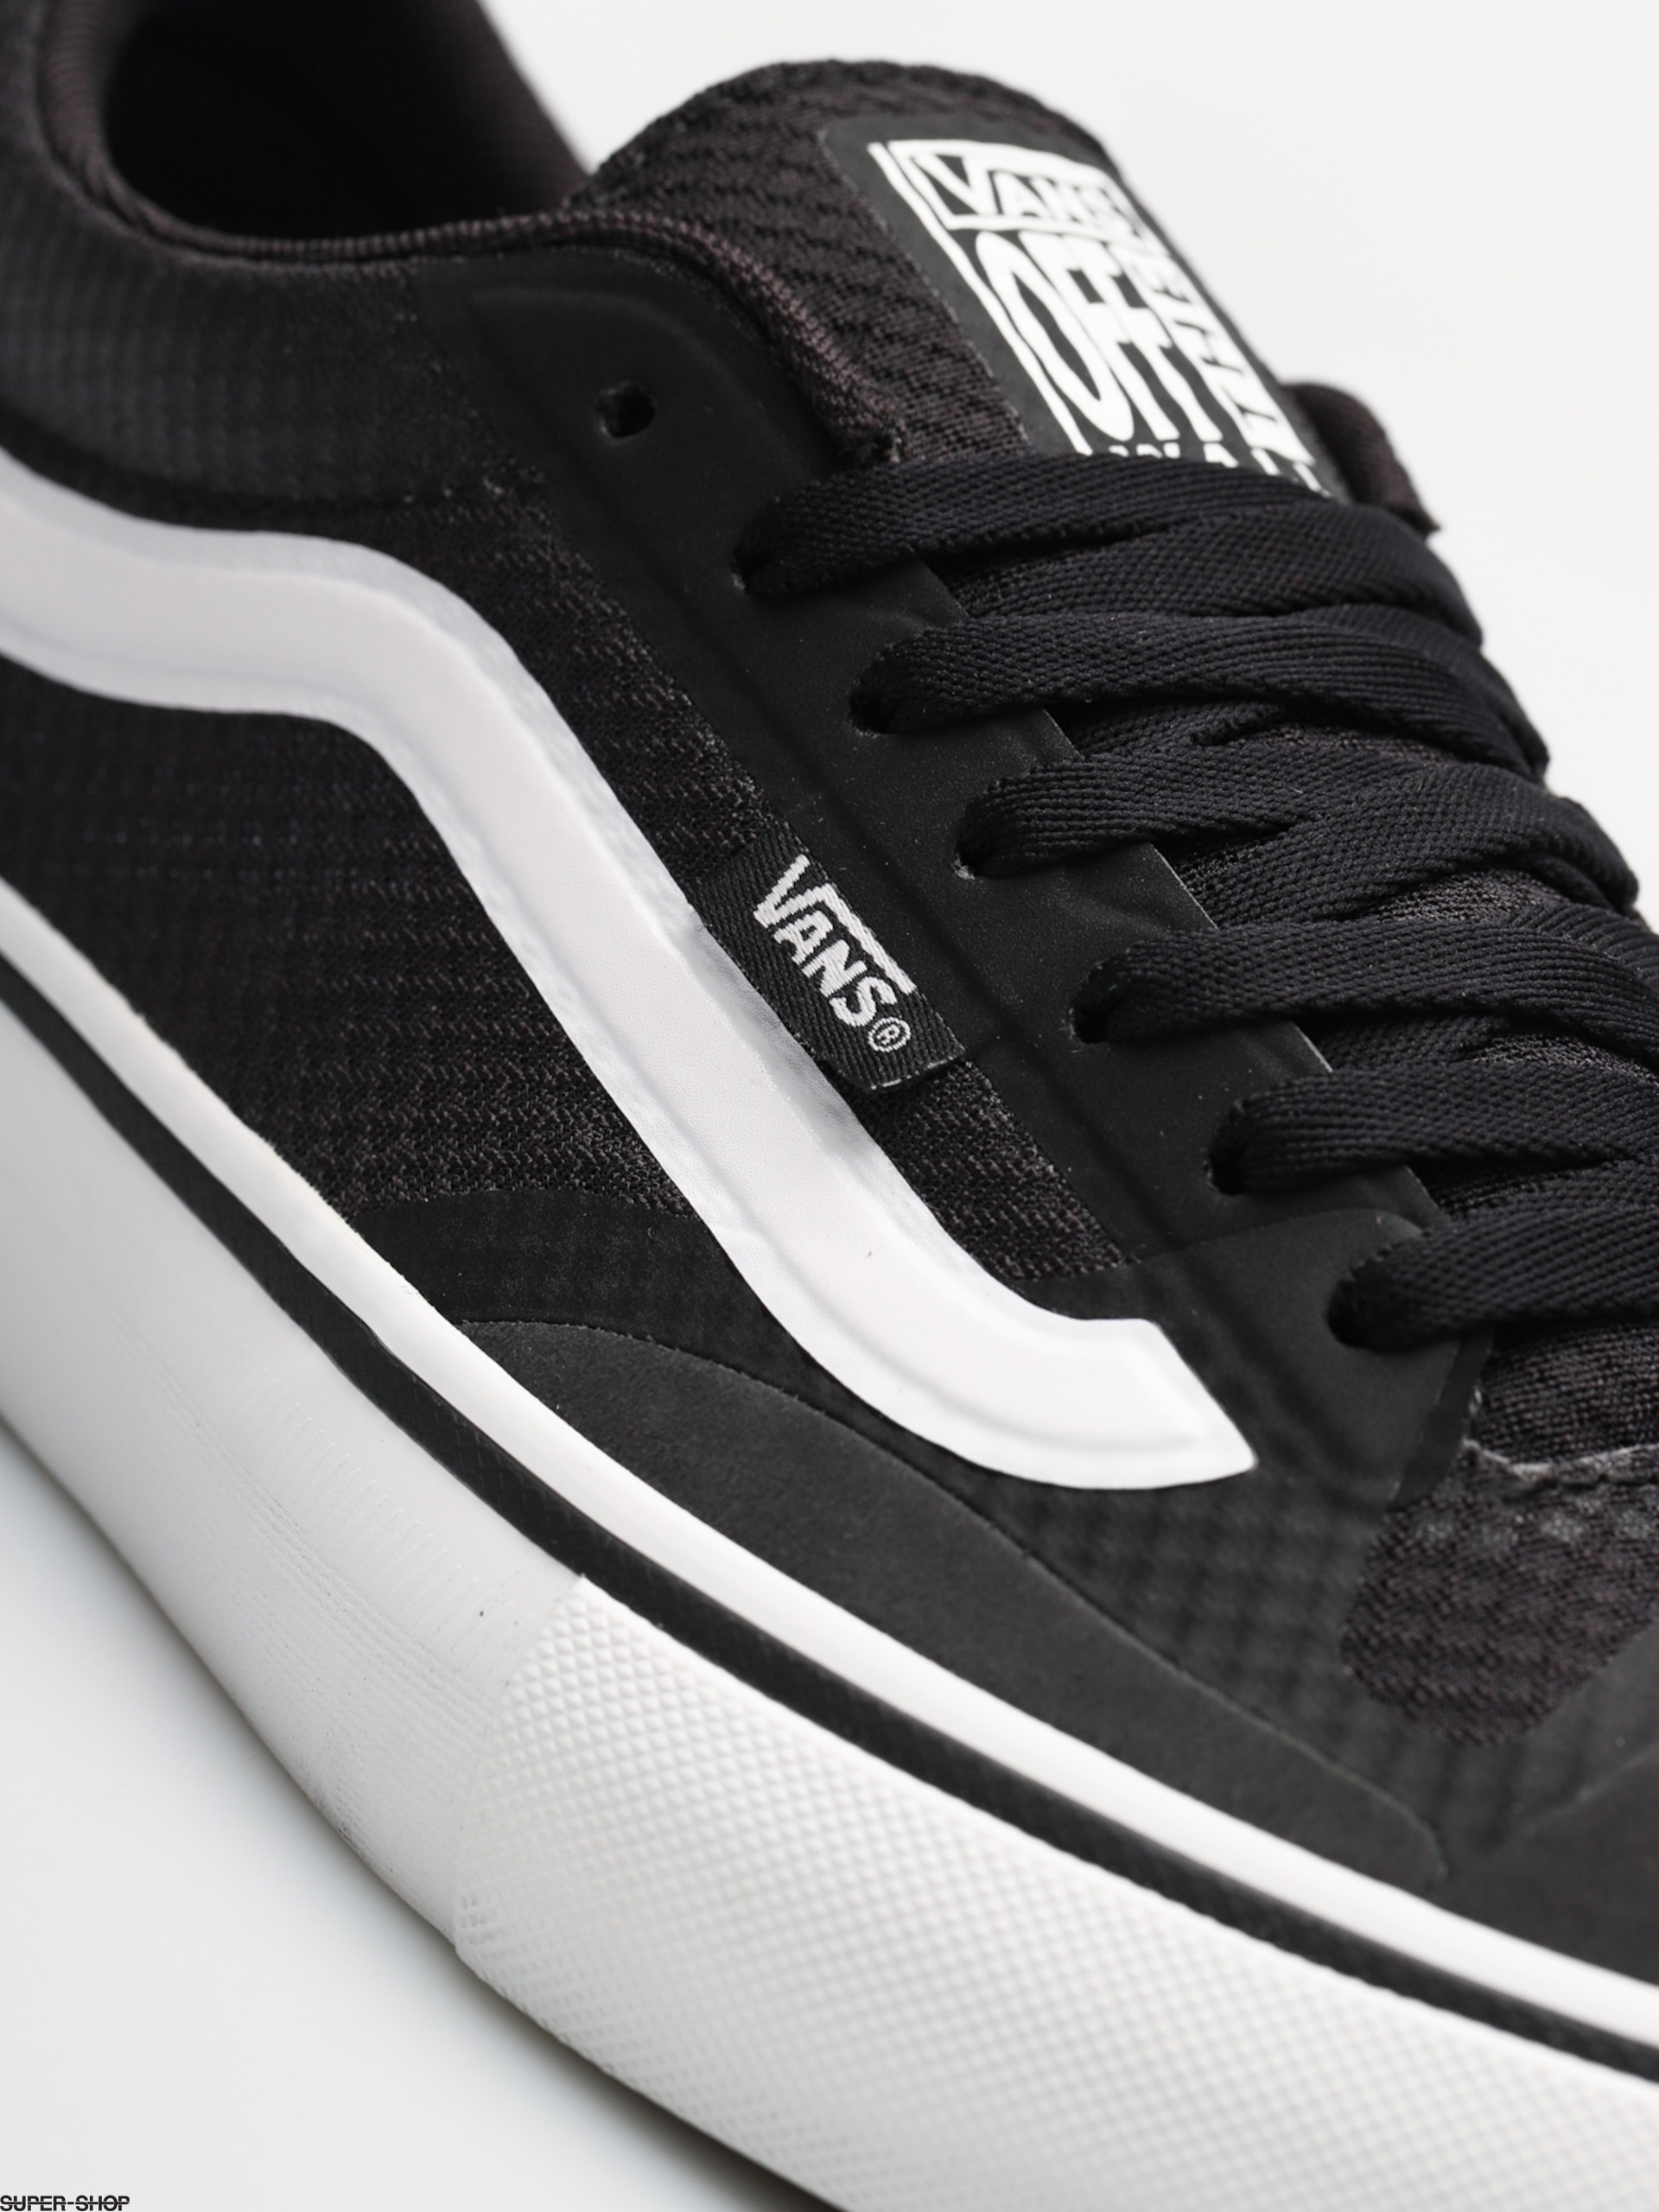 5d5bfd1ee73ff0 Vans Shoes Ave Rapidweld Pro Lite (black white)